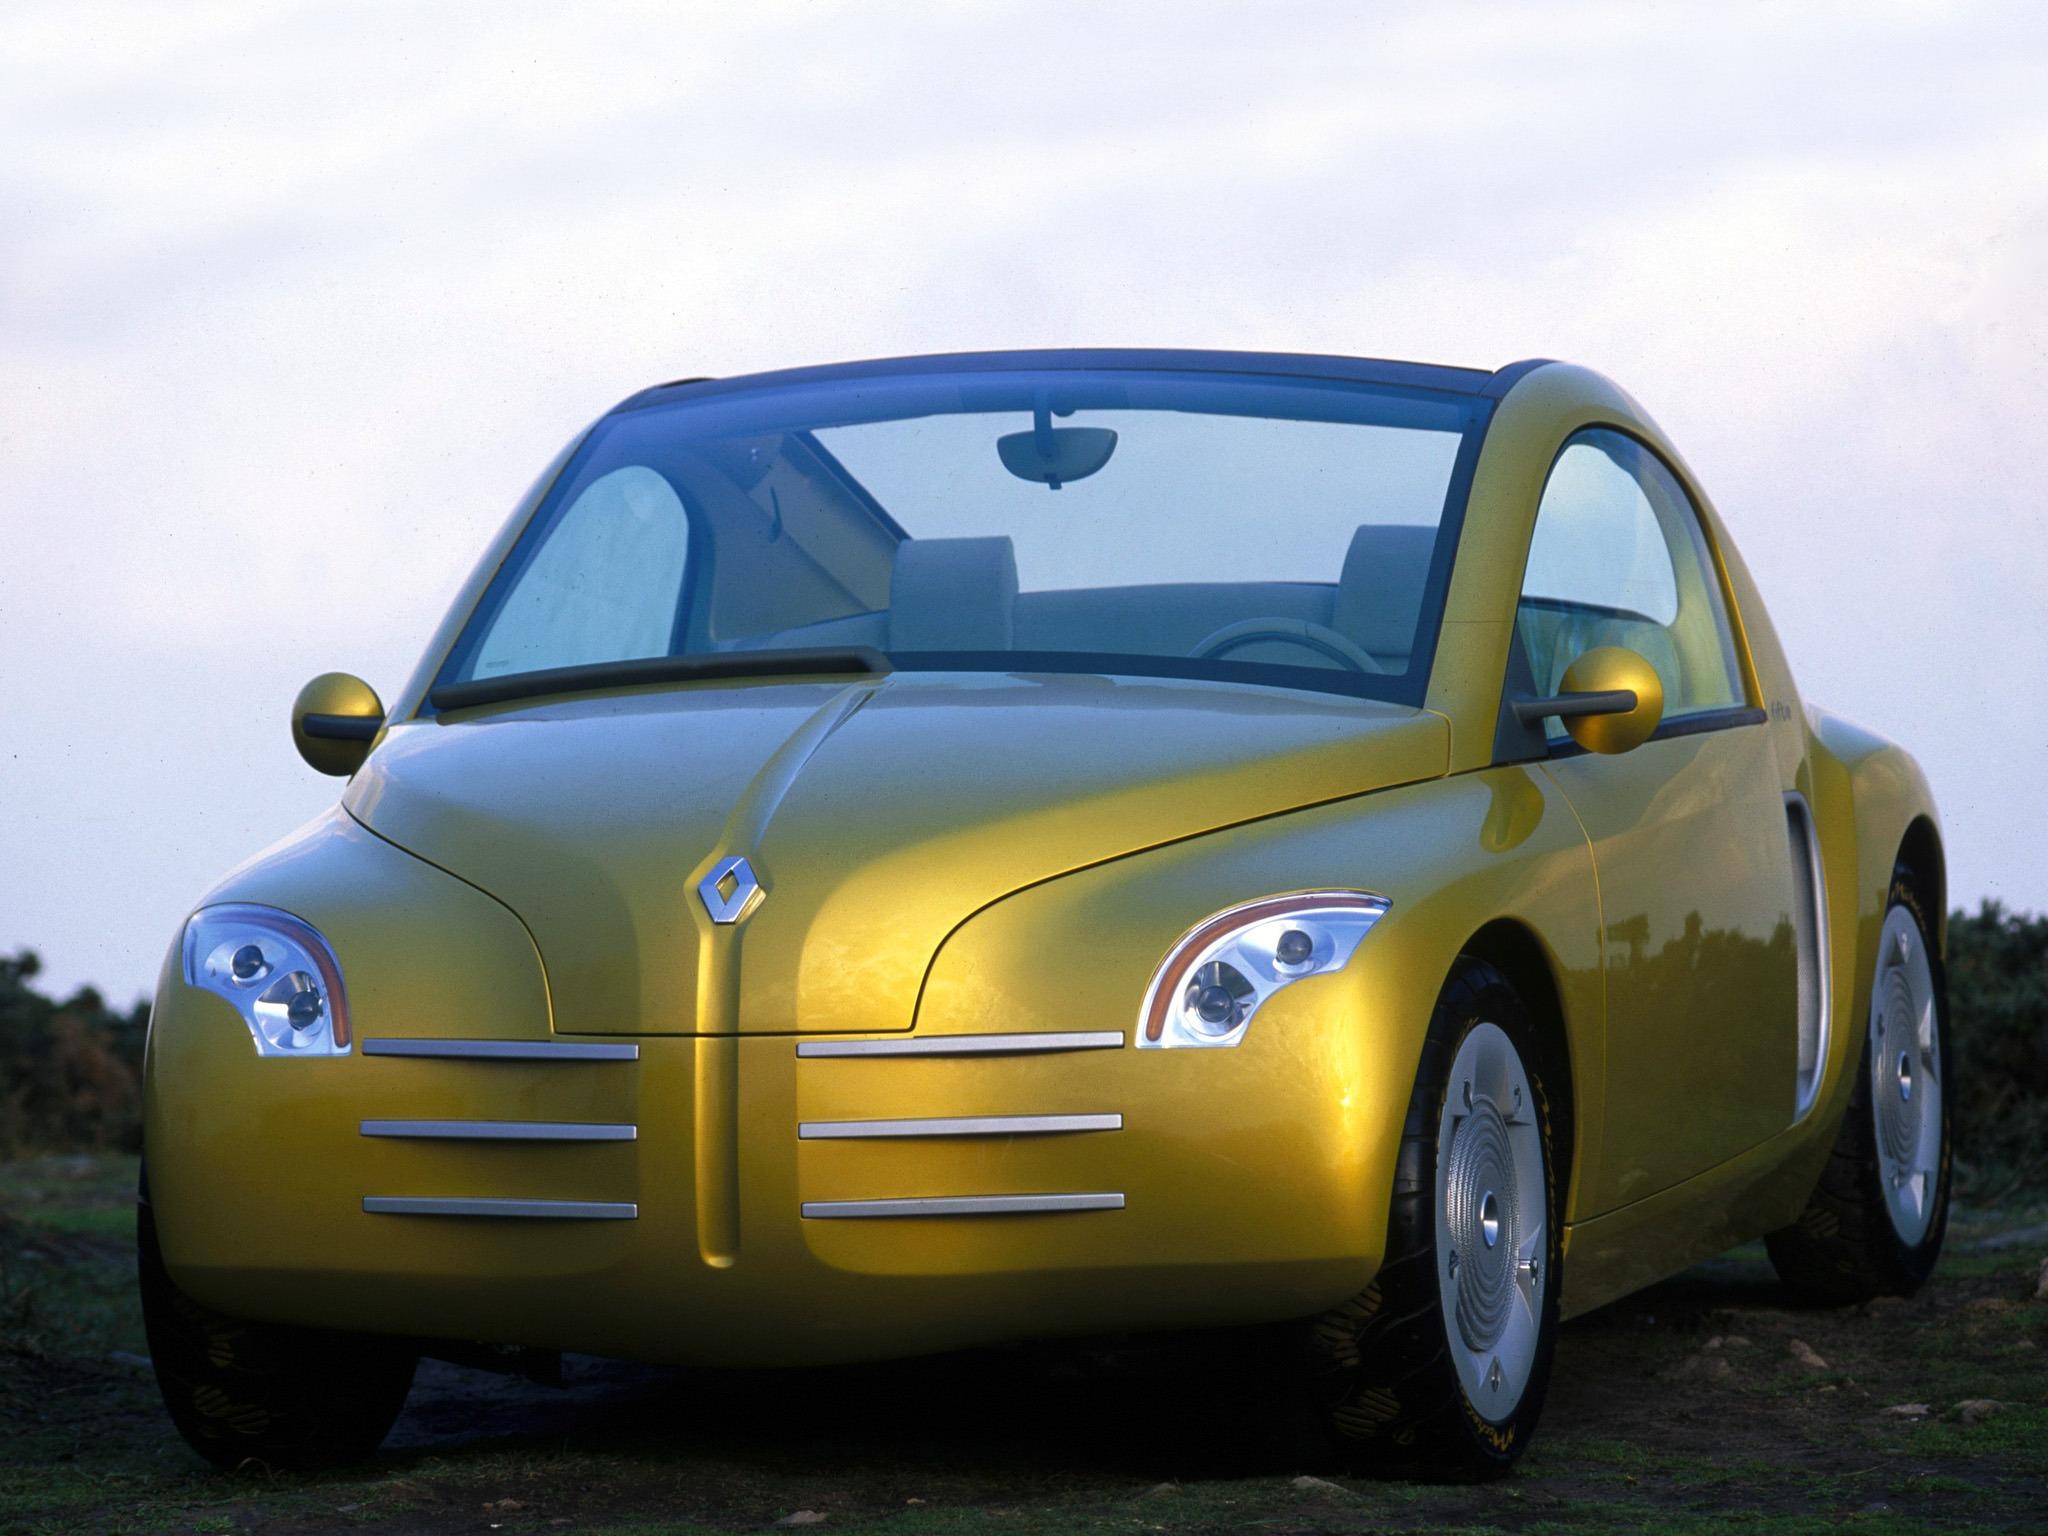 renault fiftie concept 1996 old concept cars. Black Bedroom Furniture Sets. Home Design Ideas